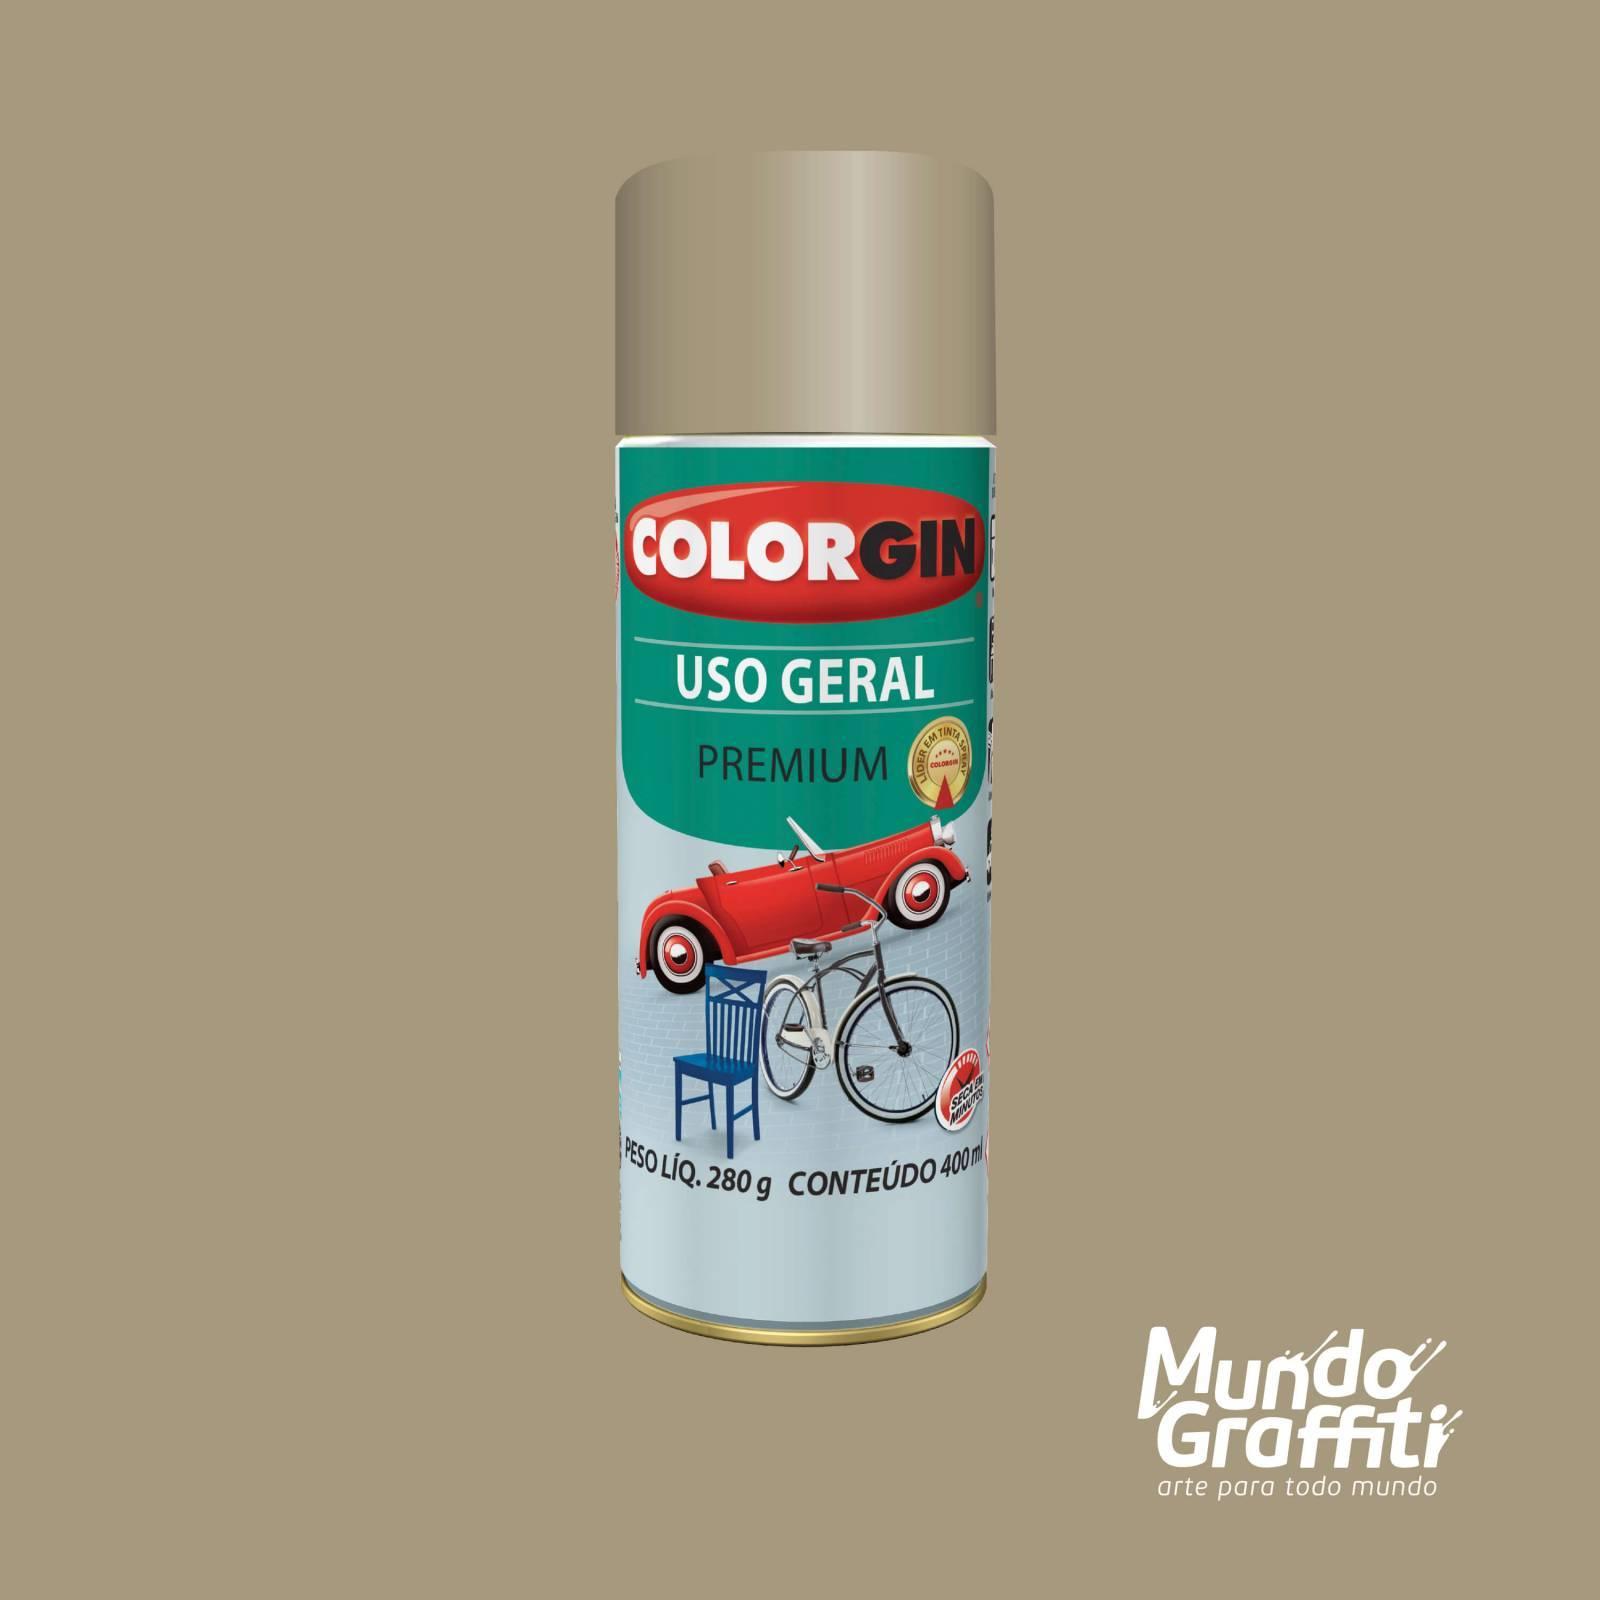 Tinta Spray Colorgin Uso Geral 55261 Bege Mediterraneo 400ml - Mundo Graffiti